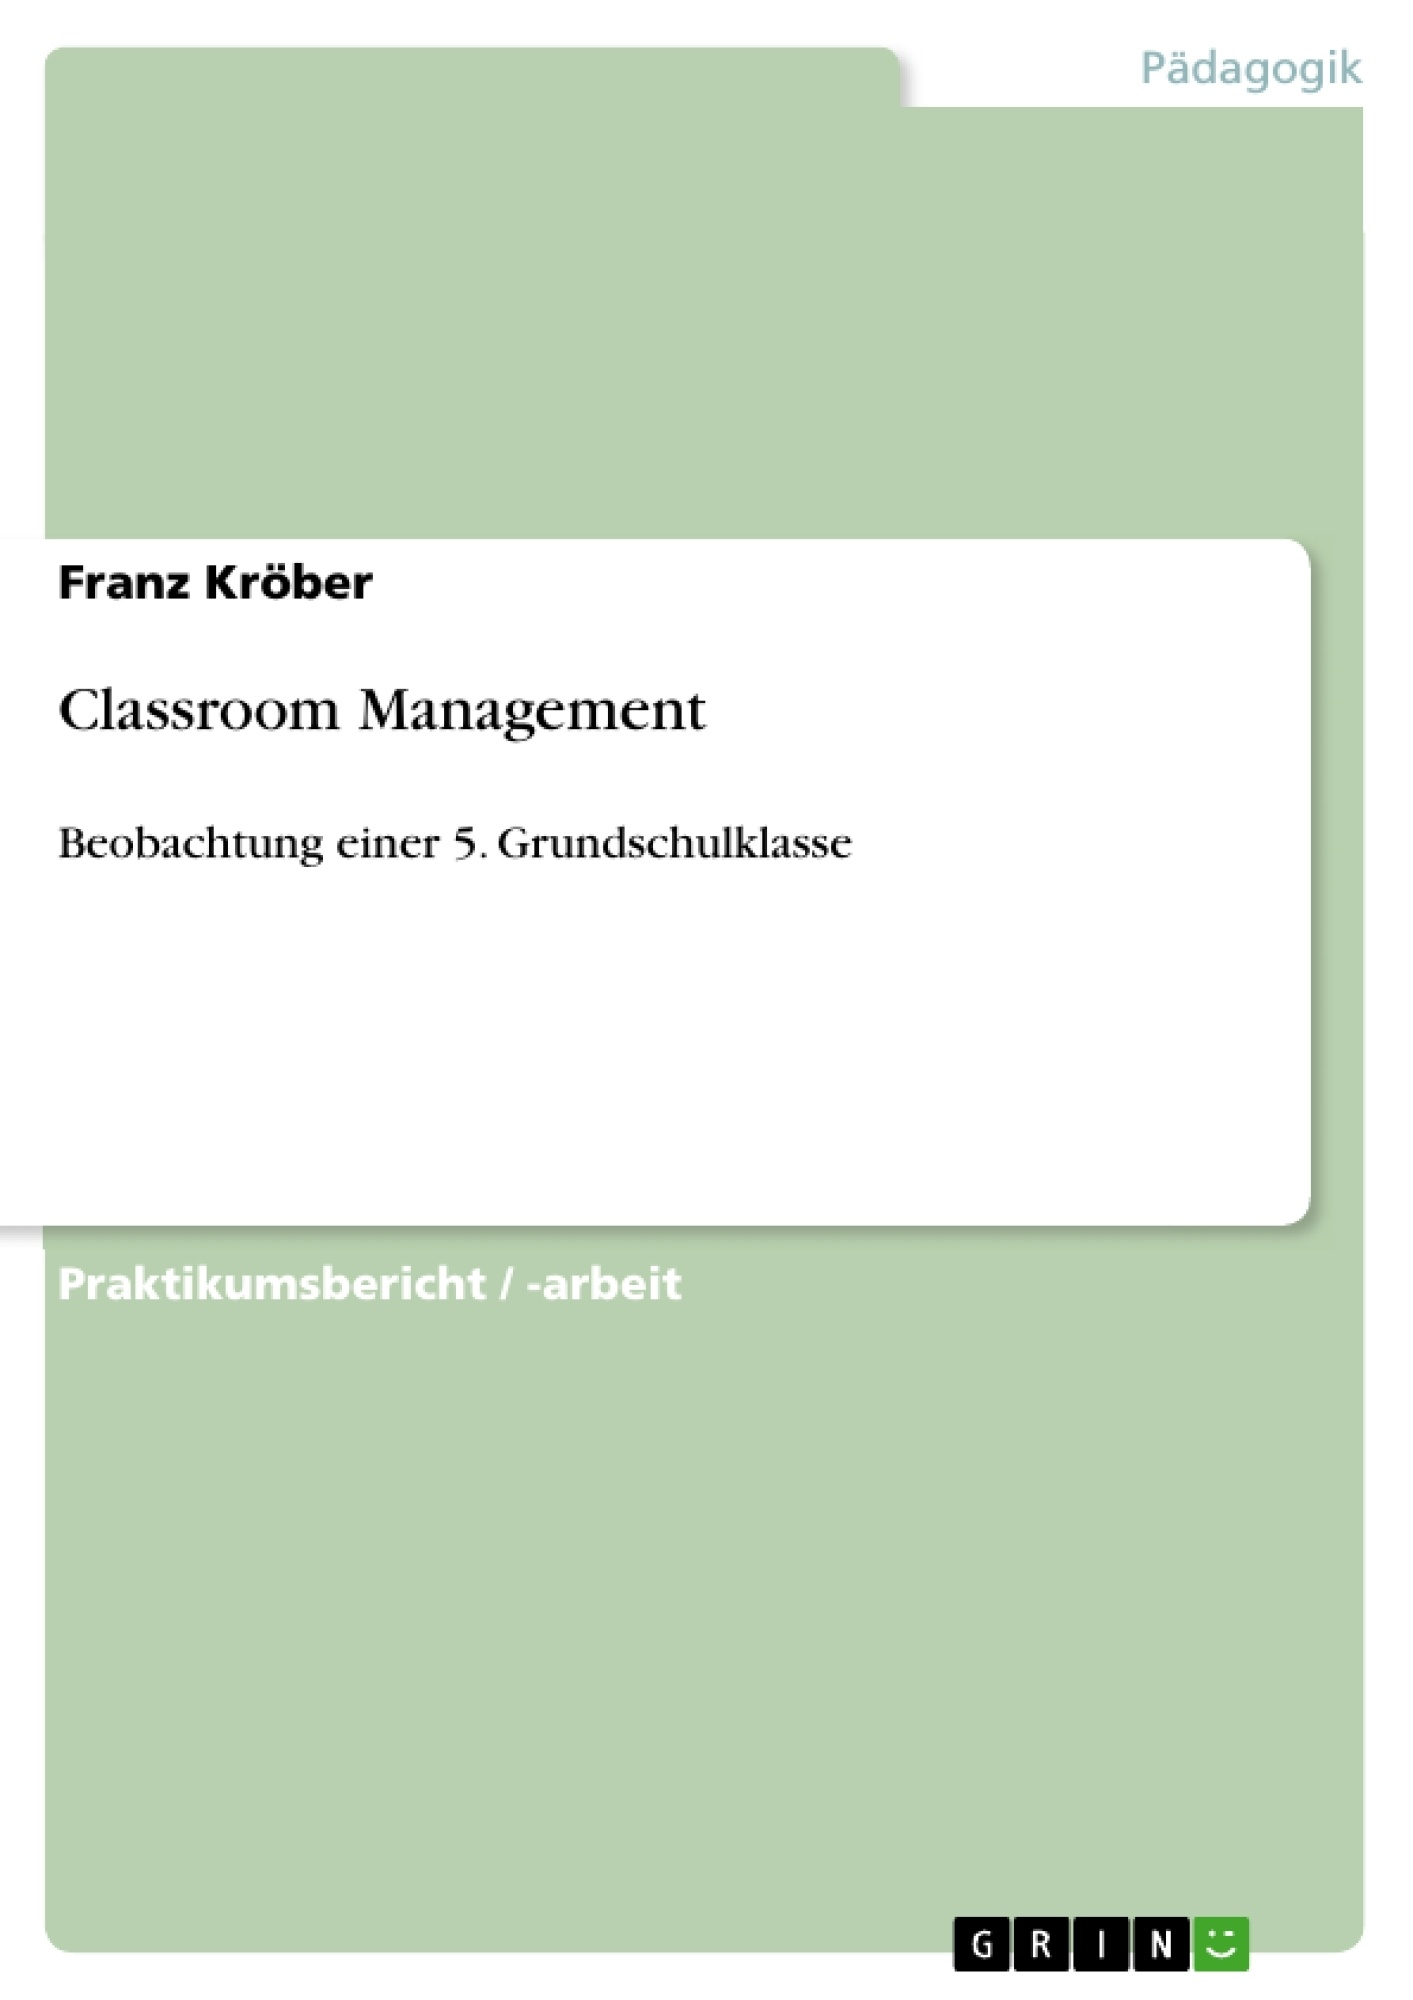 Titel: Classroom Management